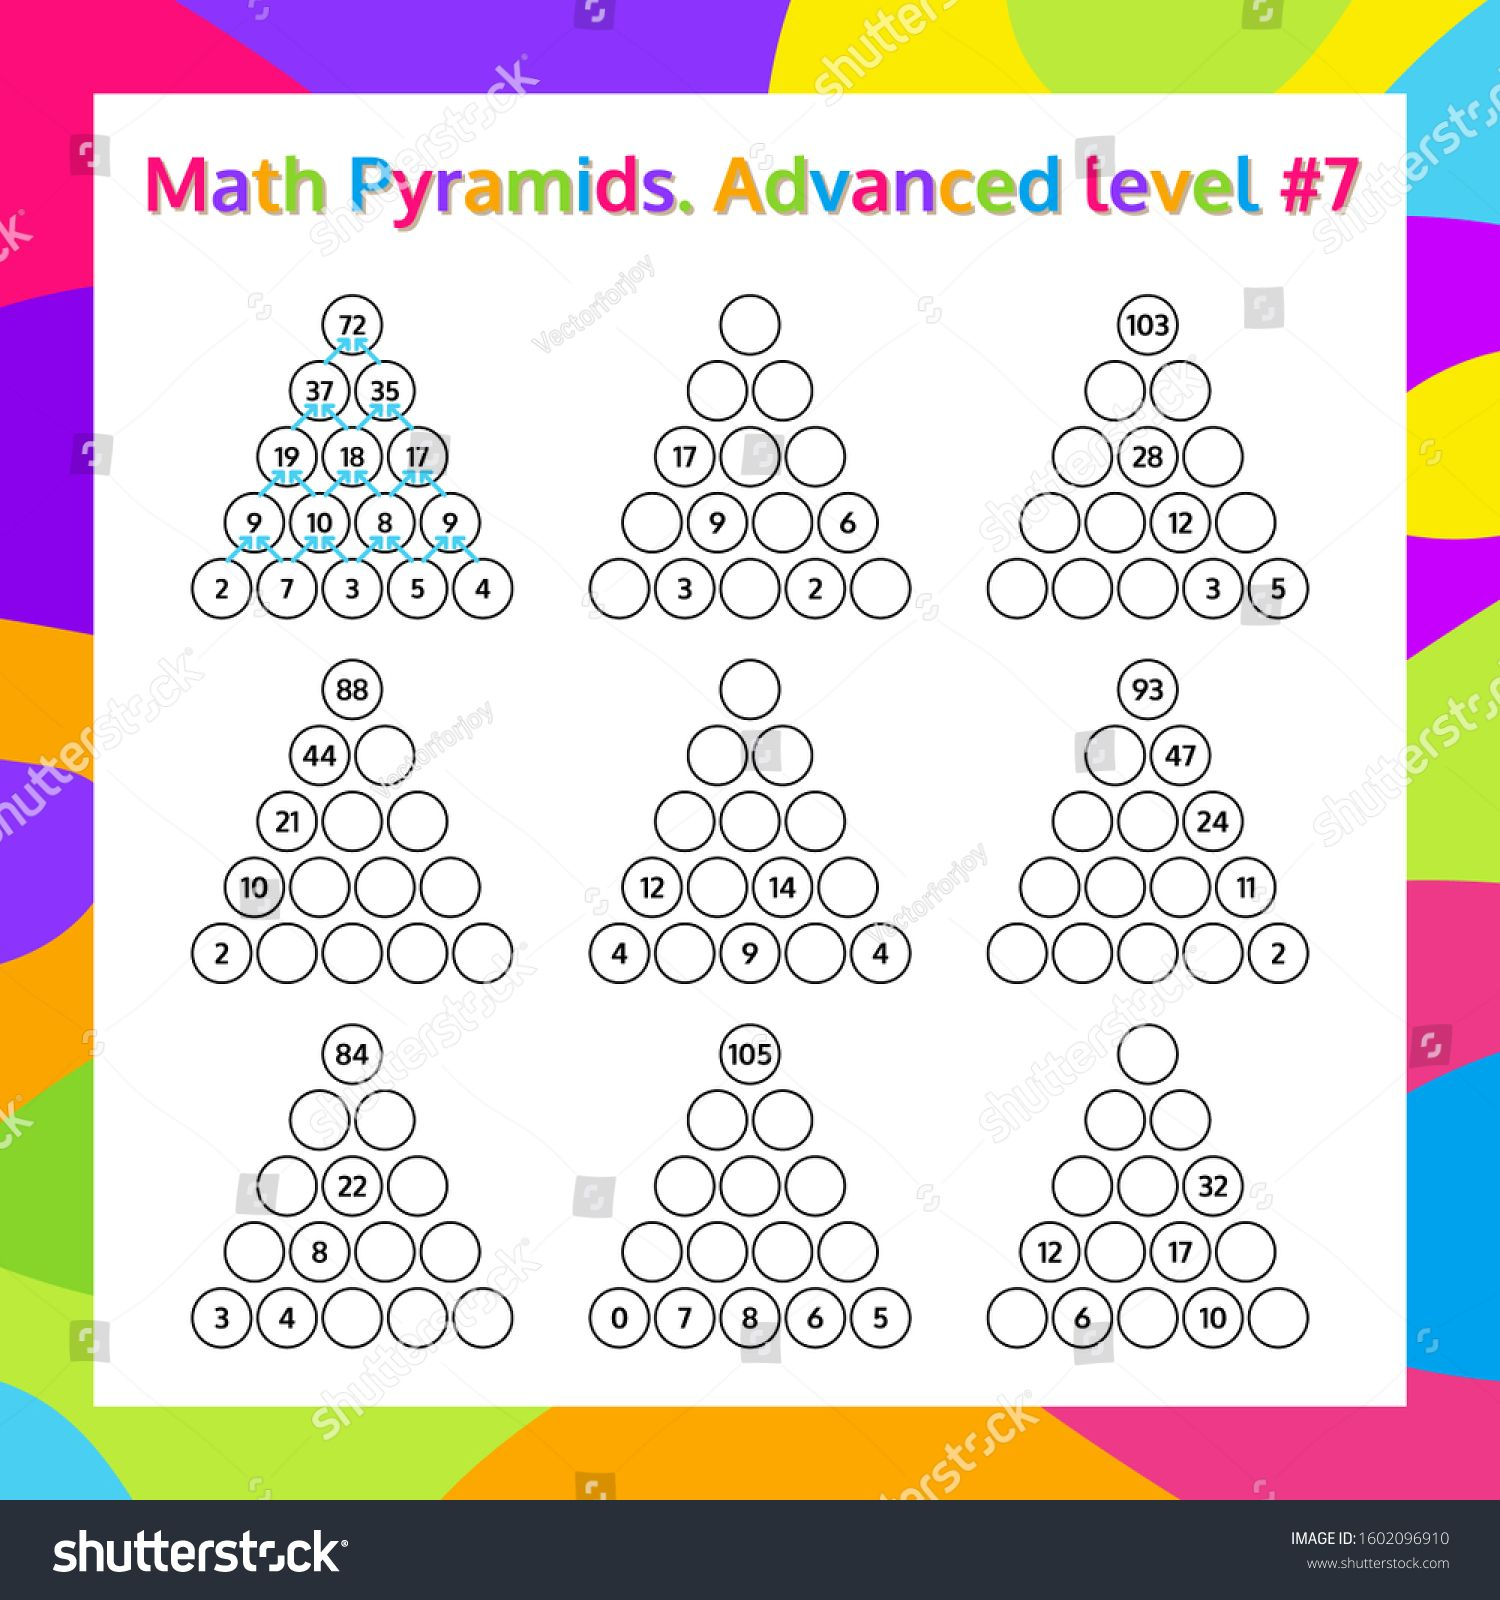 Pin On Pyramid Game